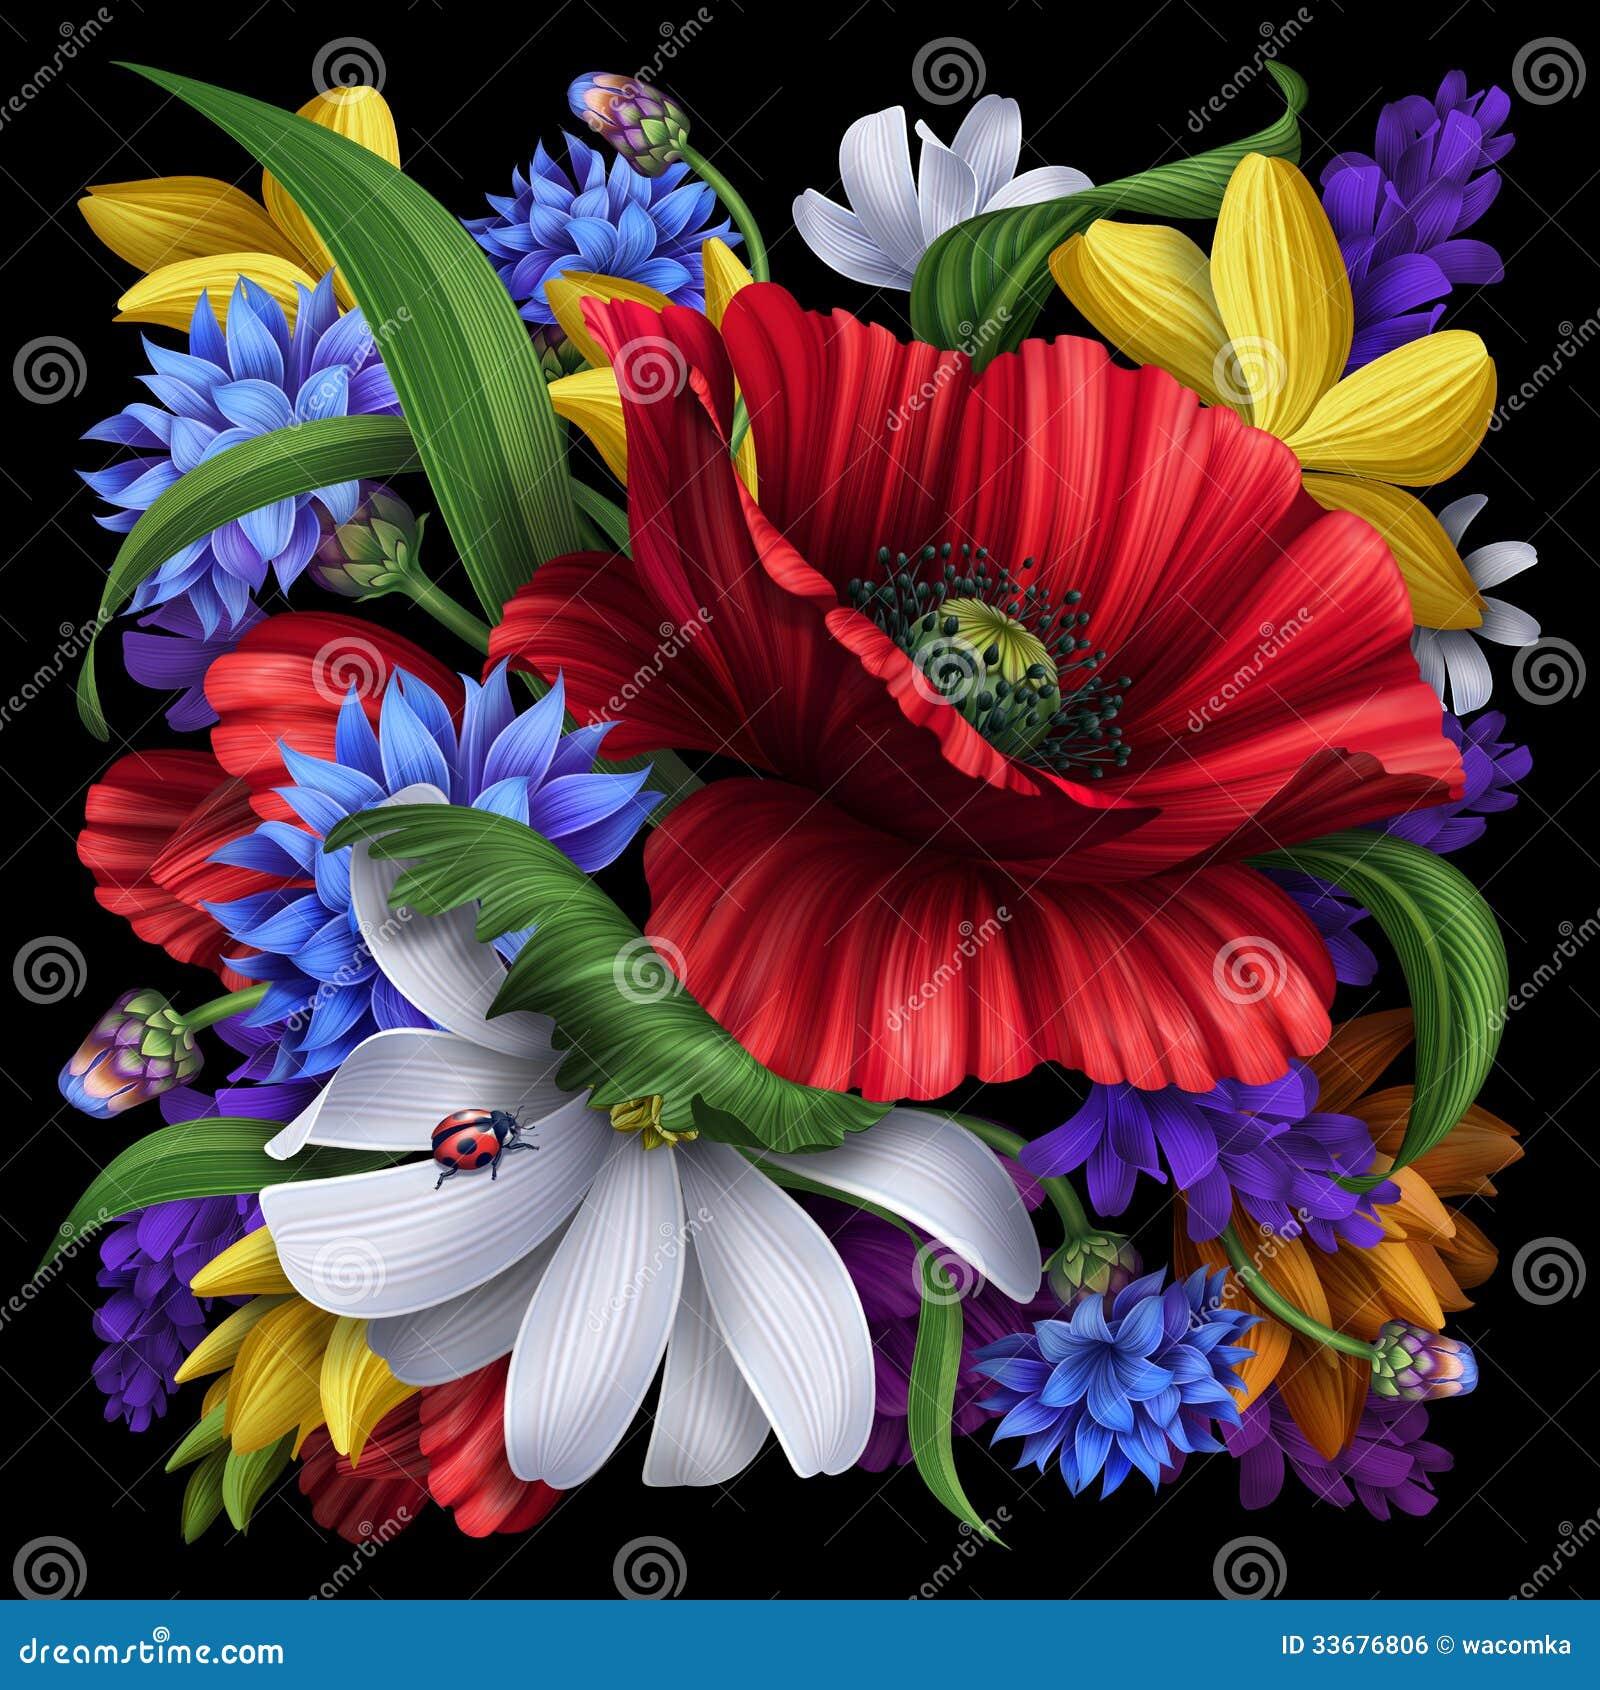 flower print wallpapers